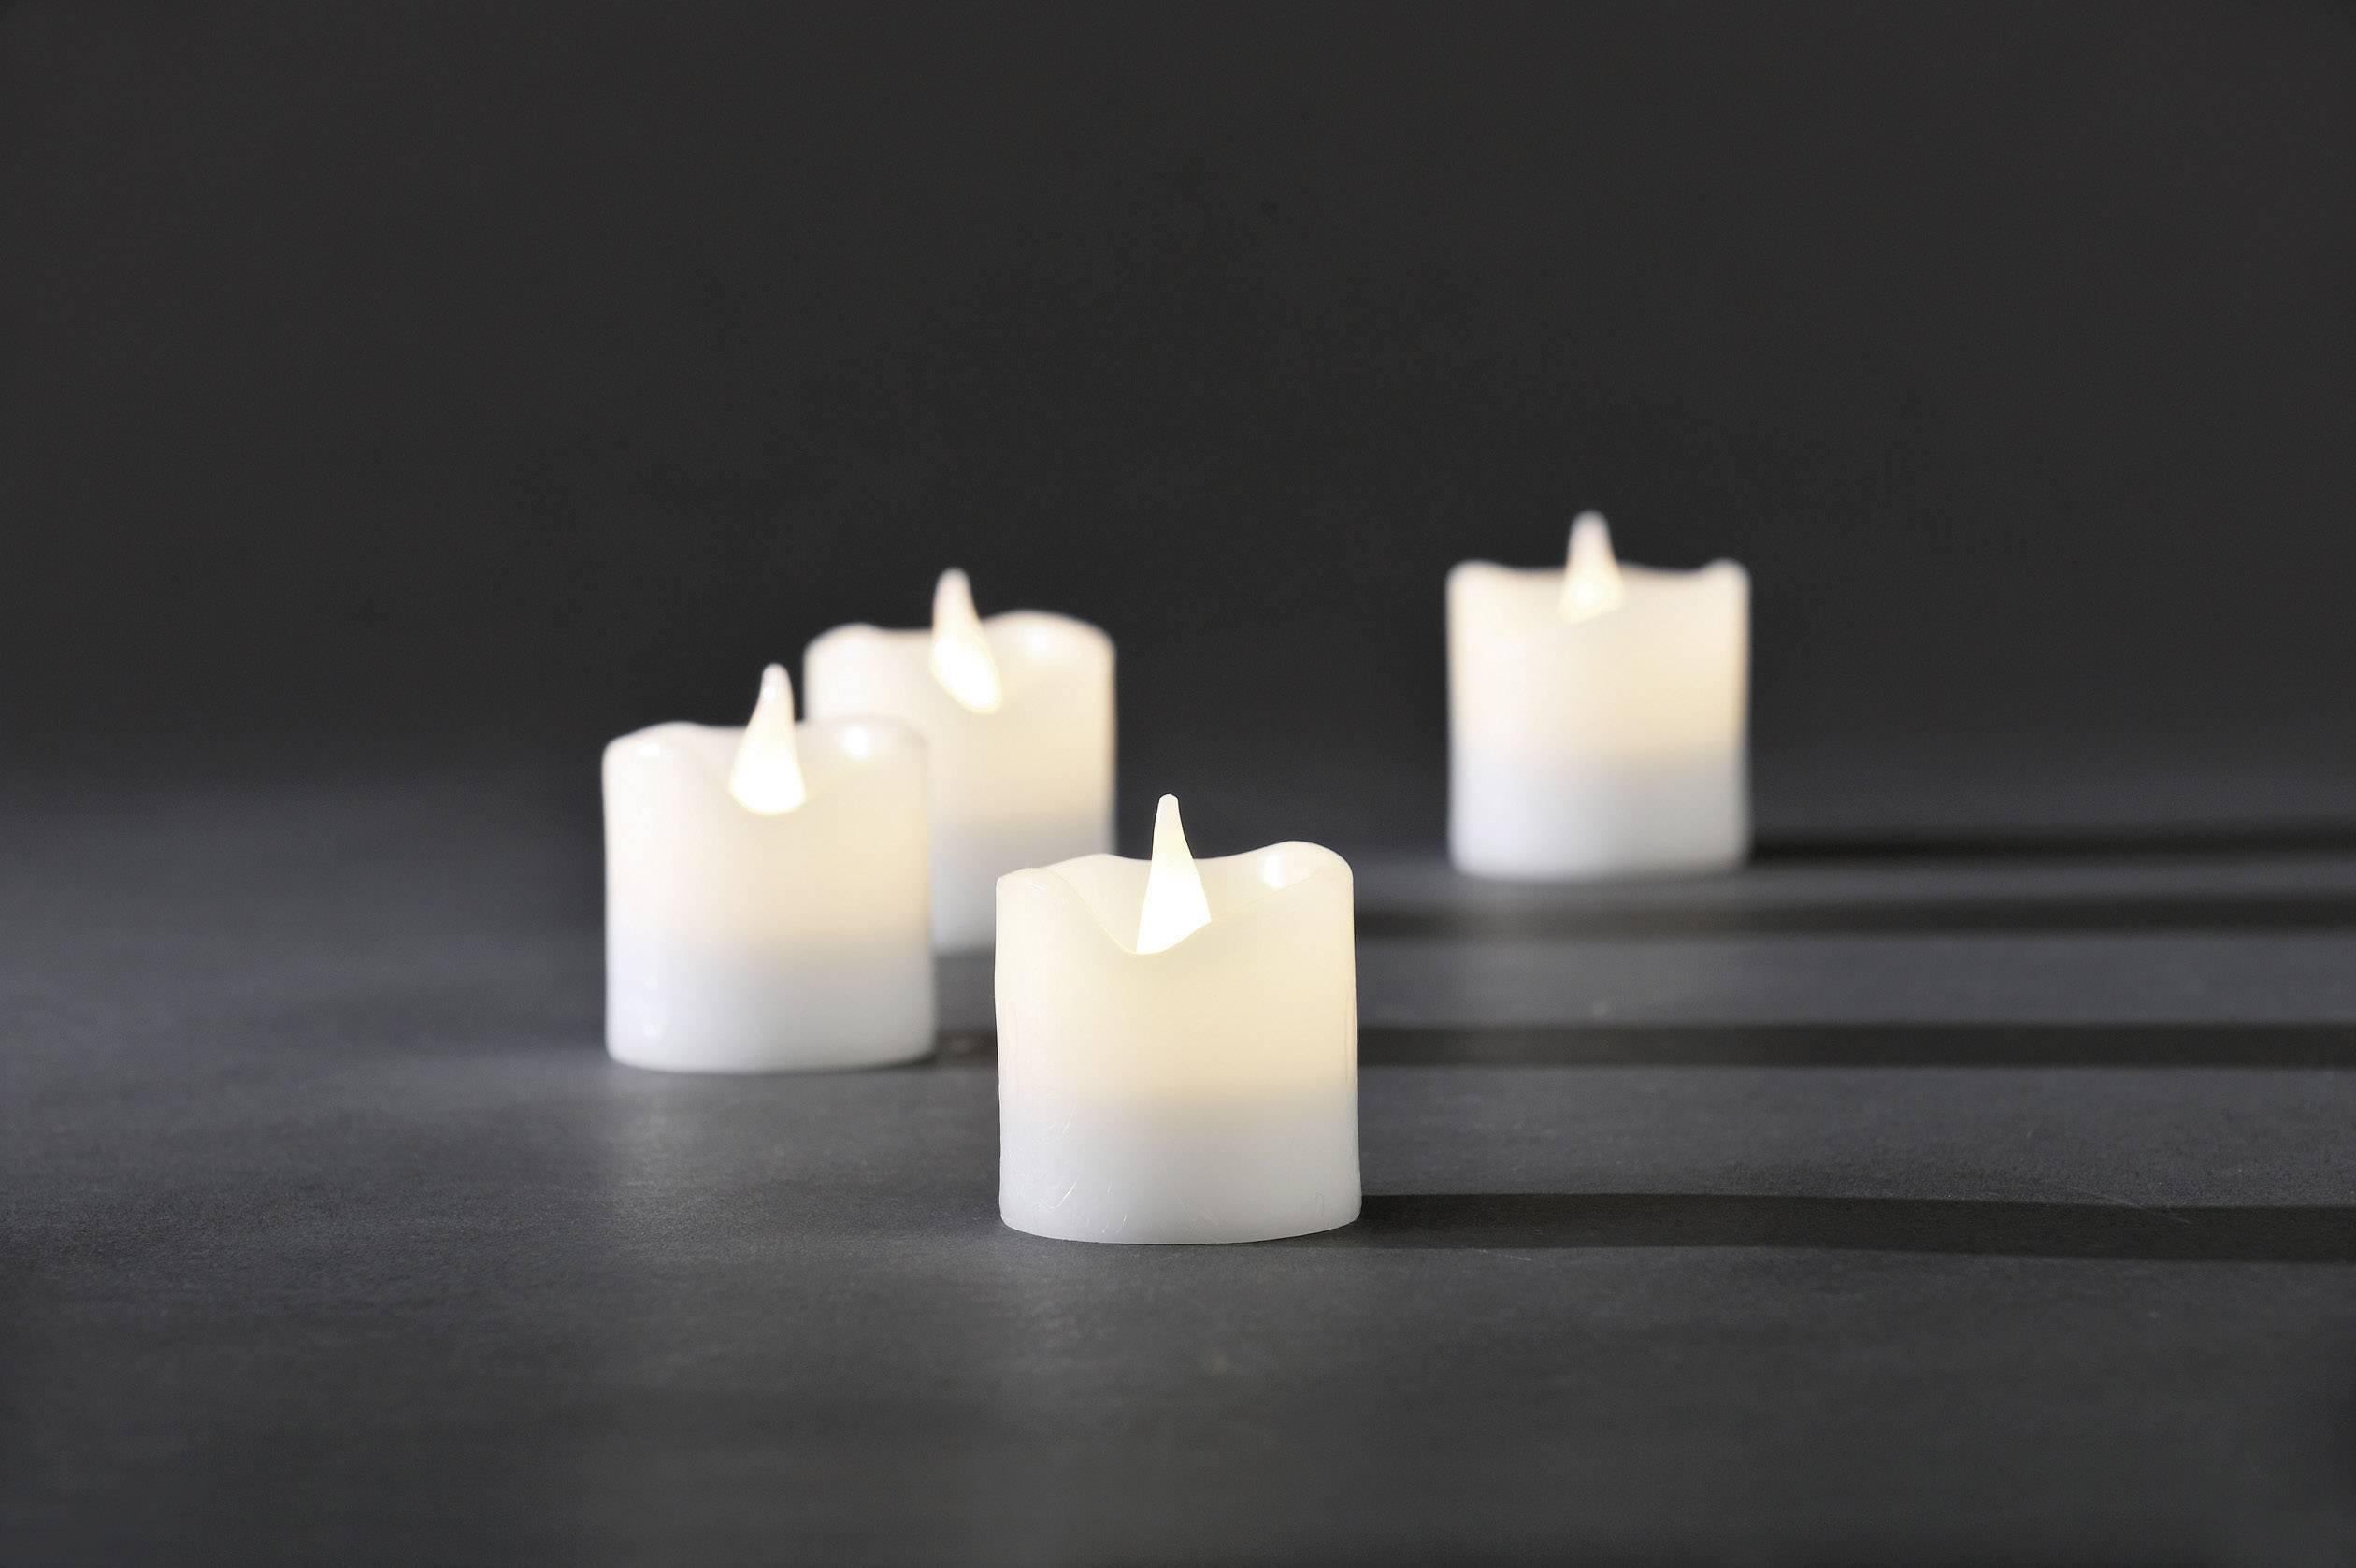 Svietiace sviečky Konstsmide, 4,2 x 4,5 cm, sada 4 ks